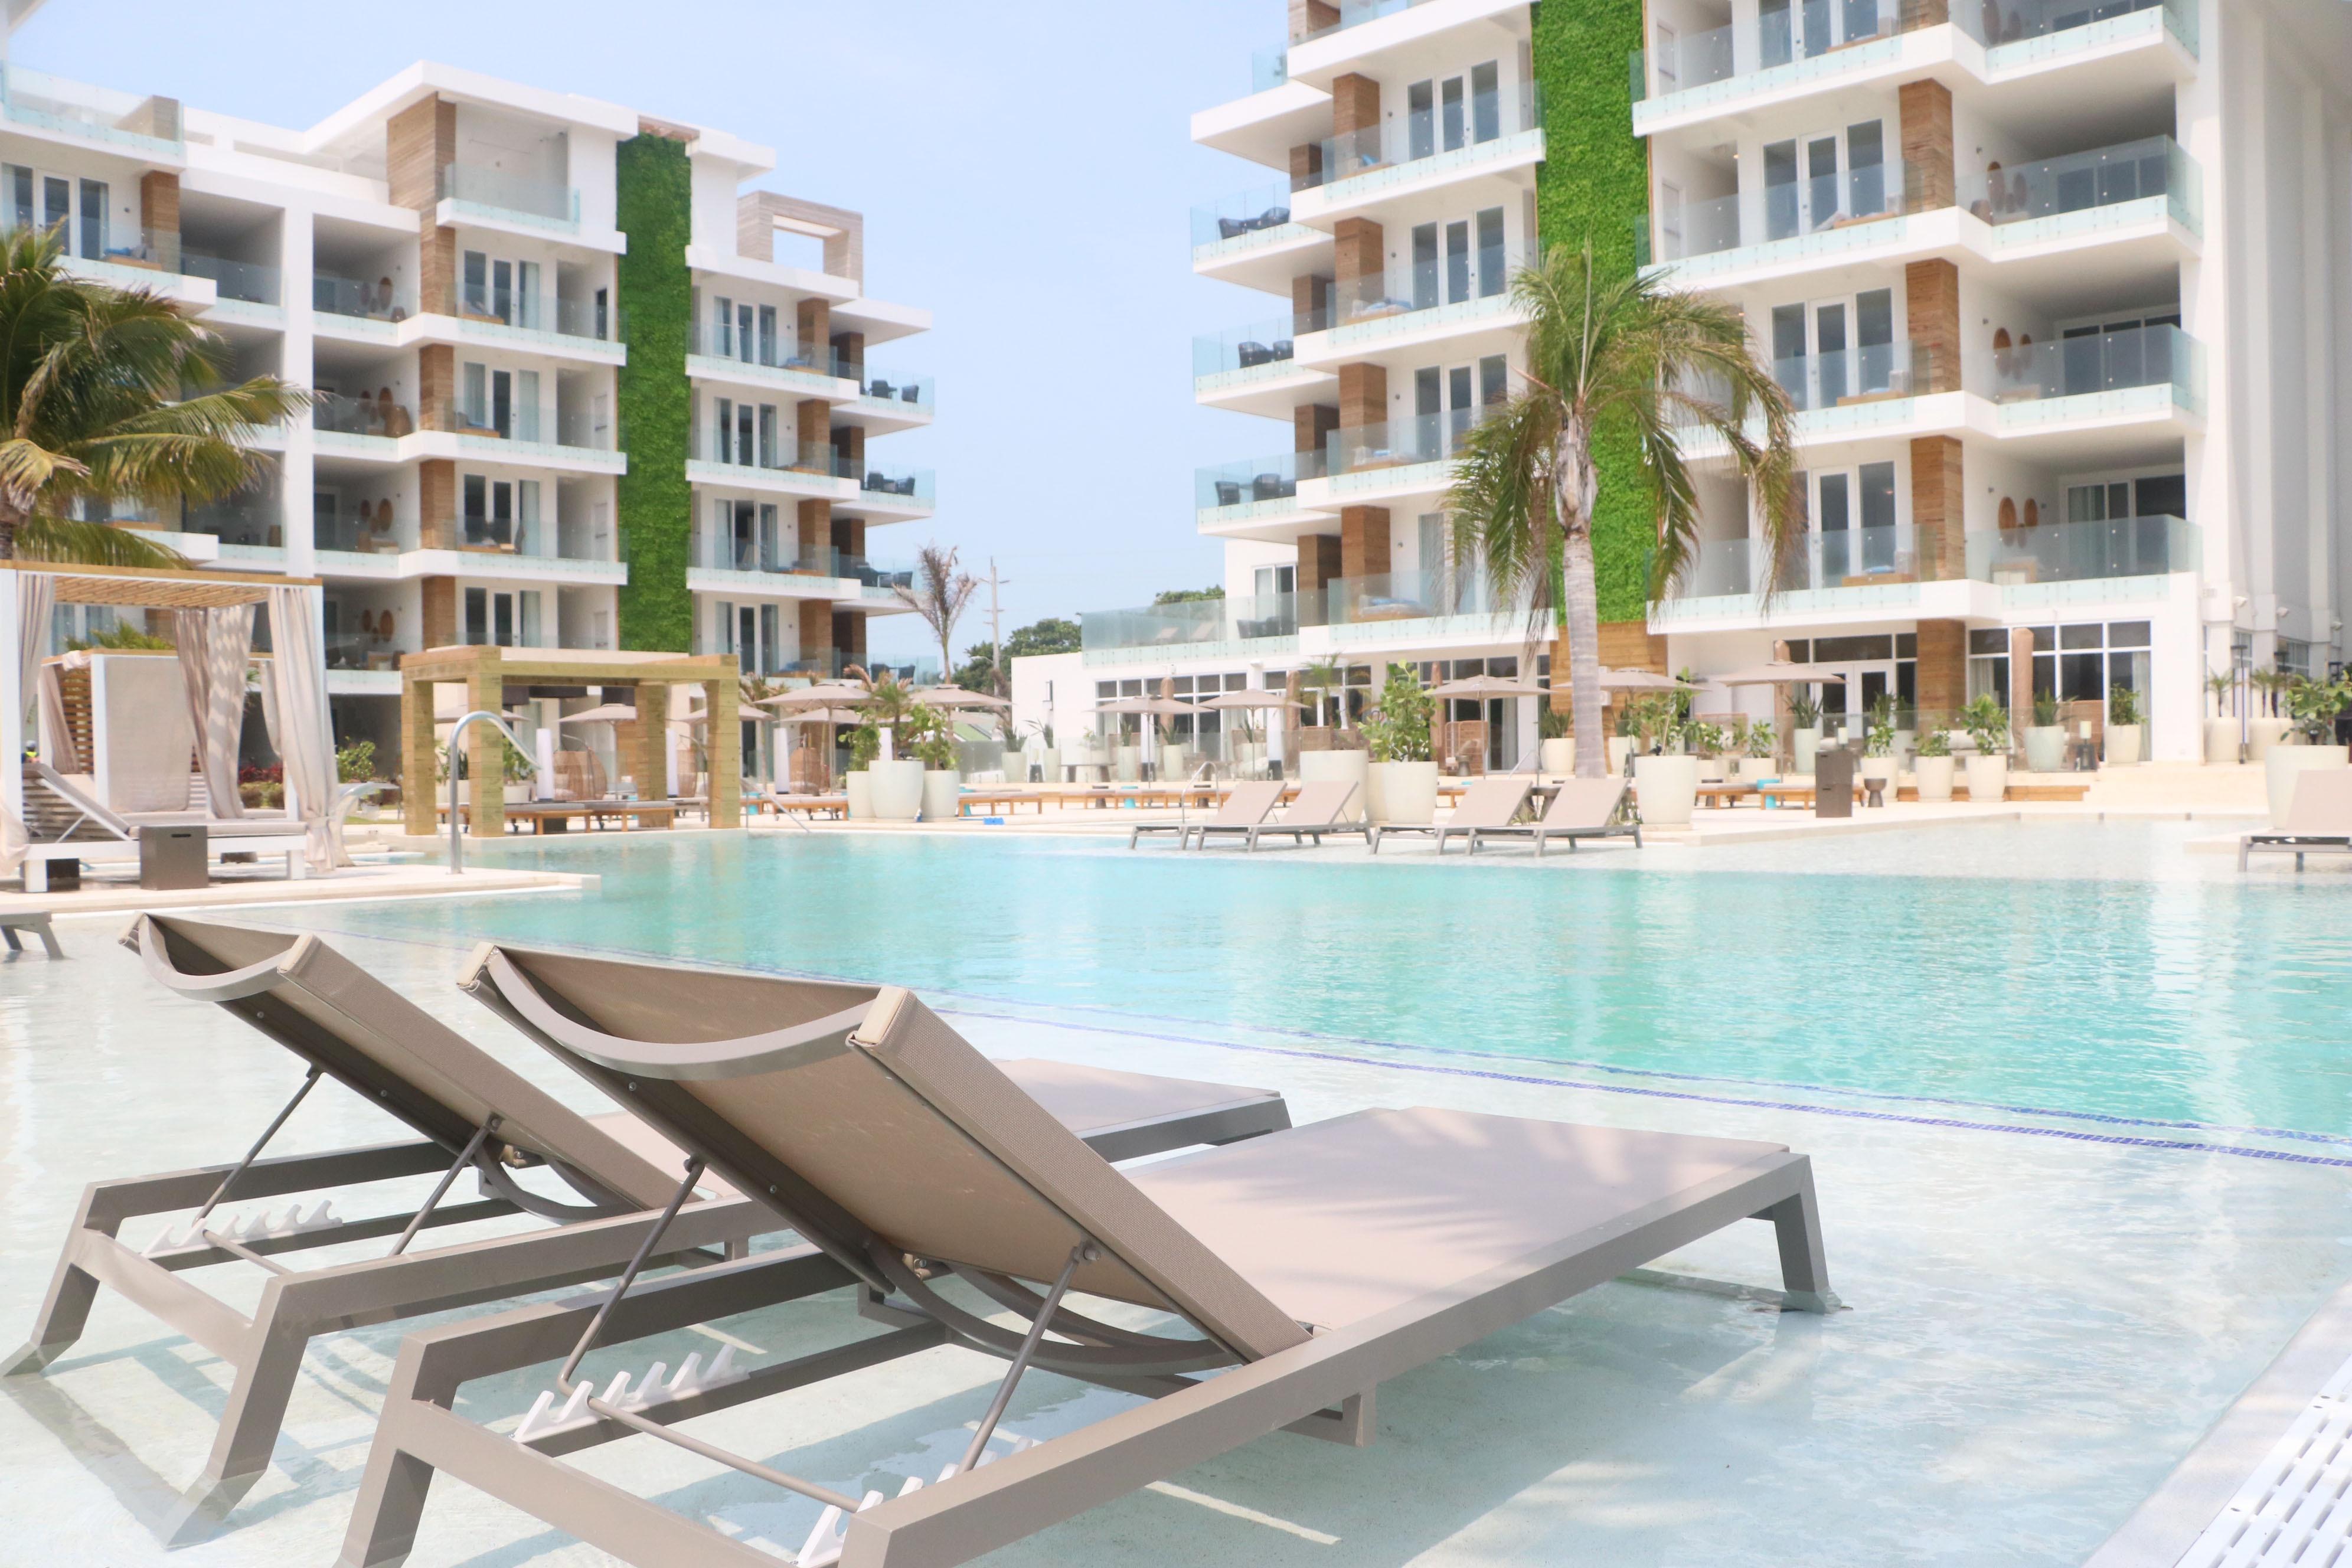 Terrace Pool Vista - Alaia Belize.jpg